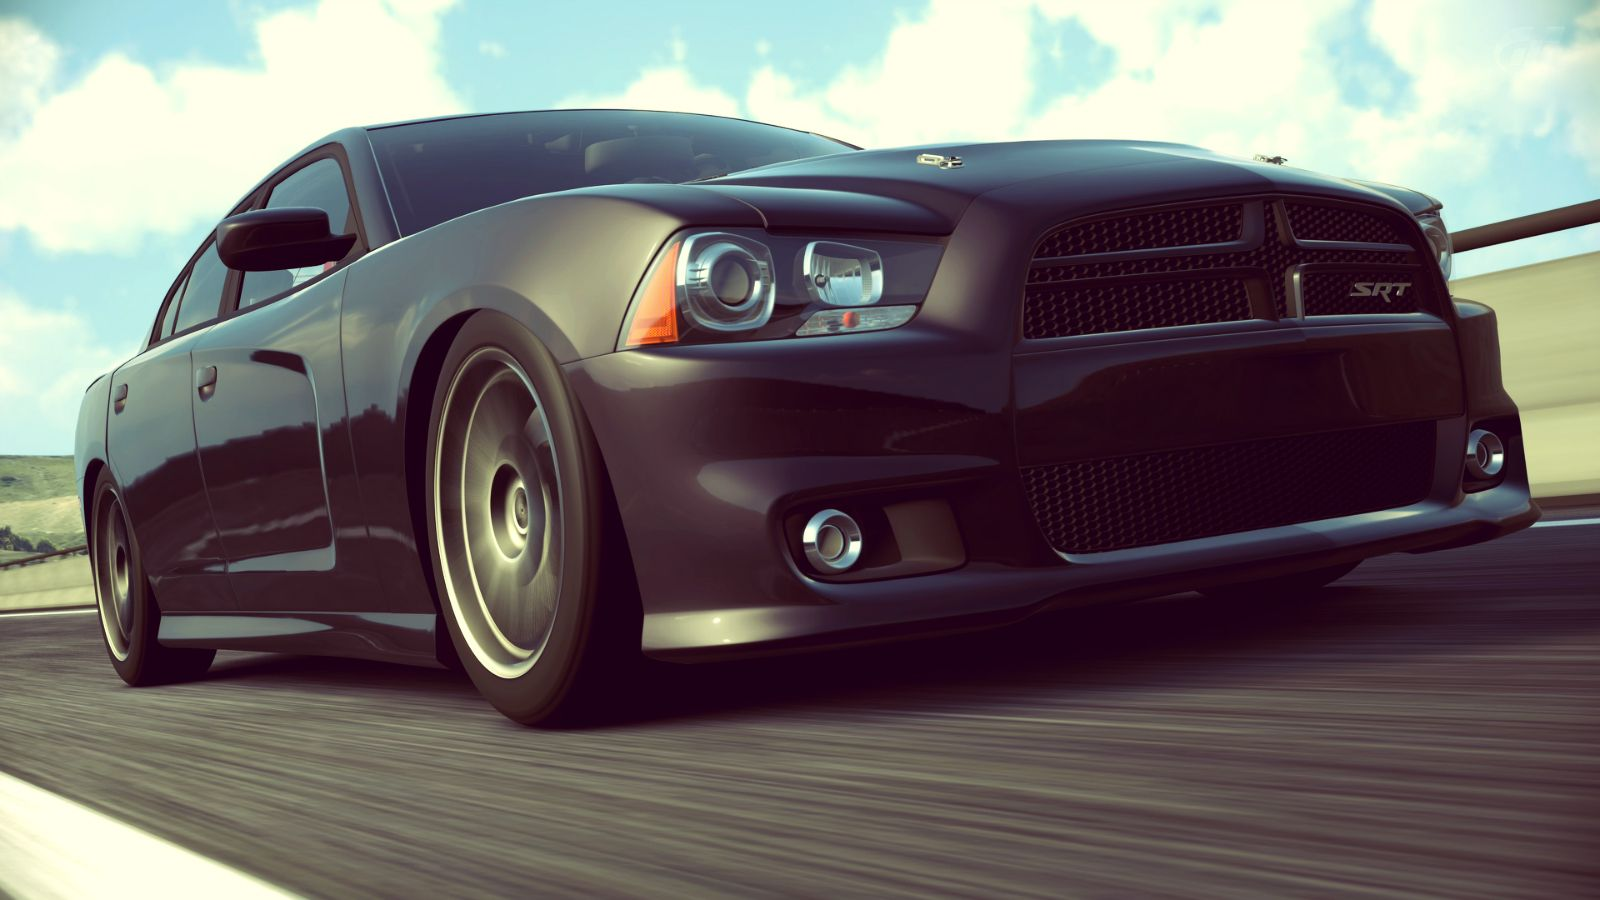 2011 Dodge Charger SRT8 (Gran Turismo 6) by Vertualissimo.deviantart.com on @deviantART